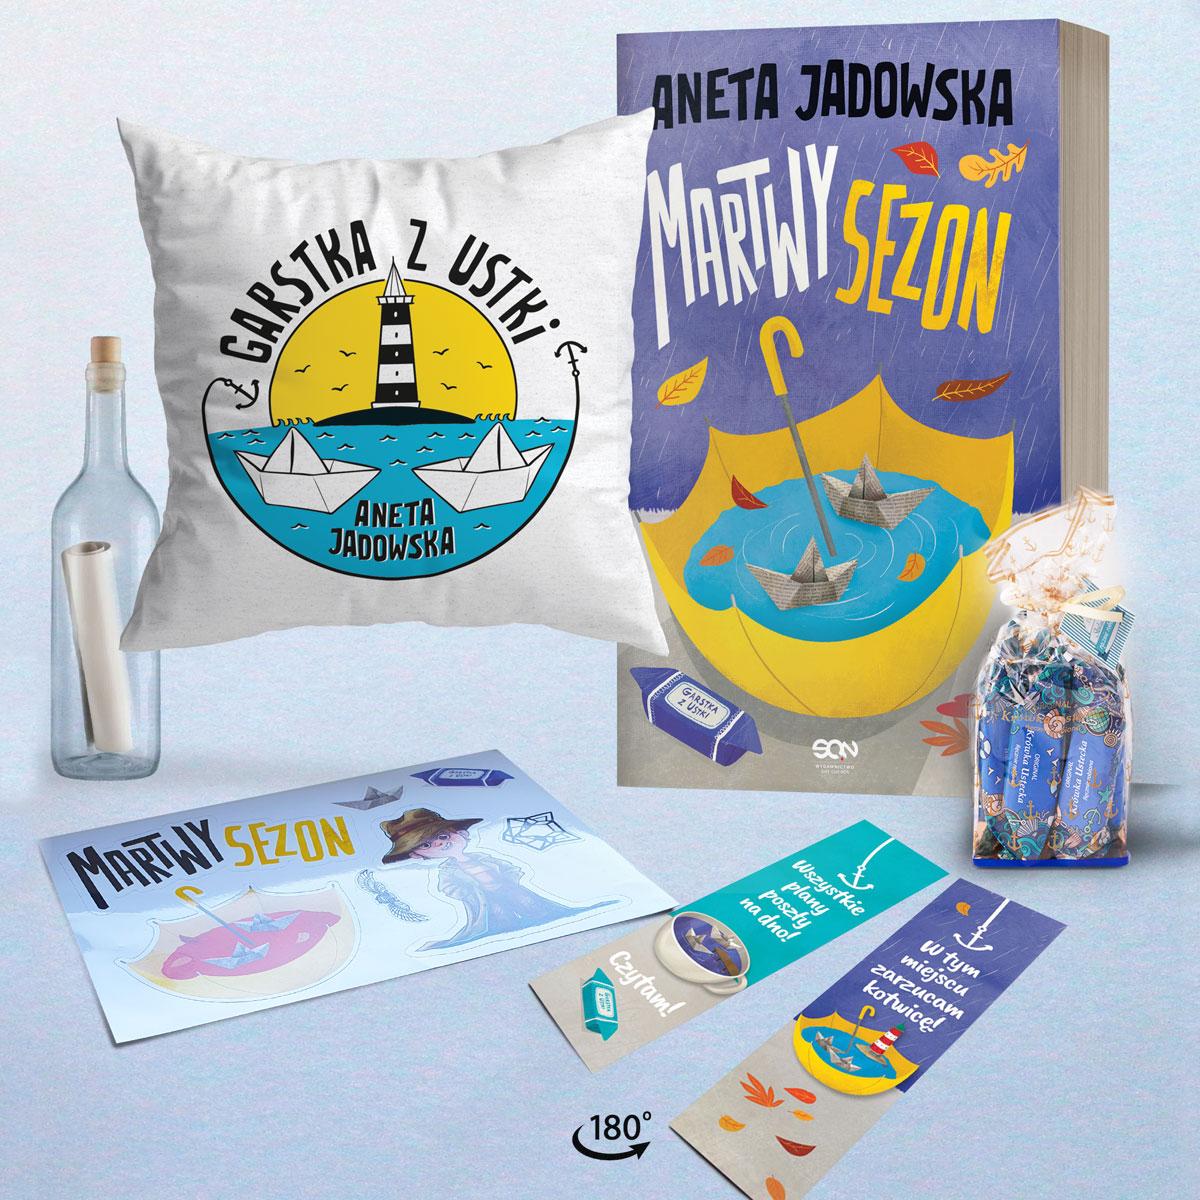 box-martwy-sezon-aneta-jadowska